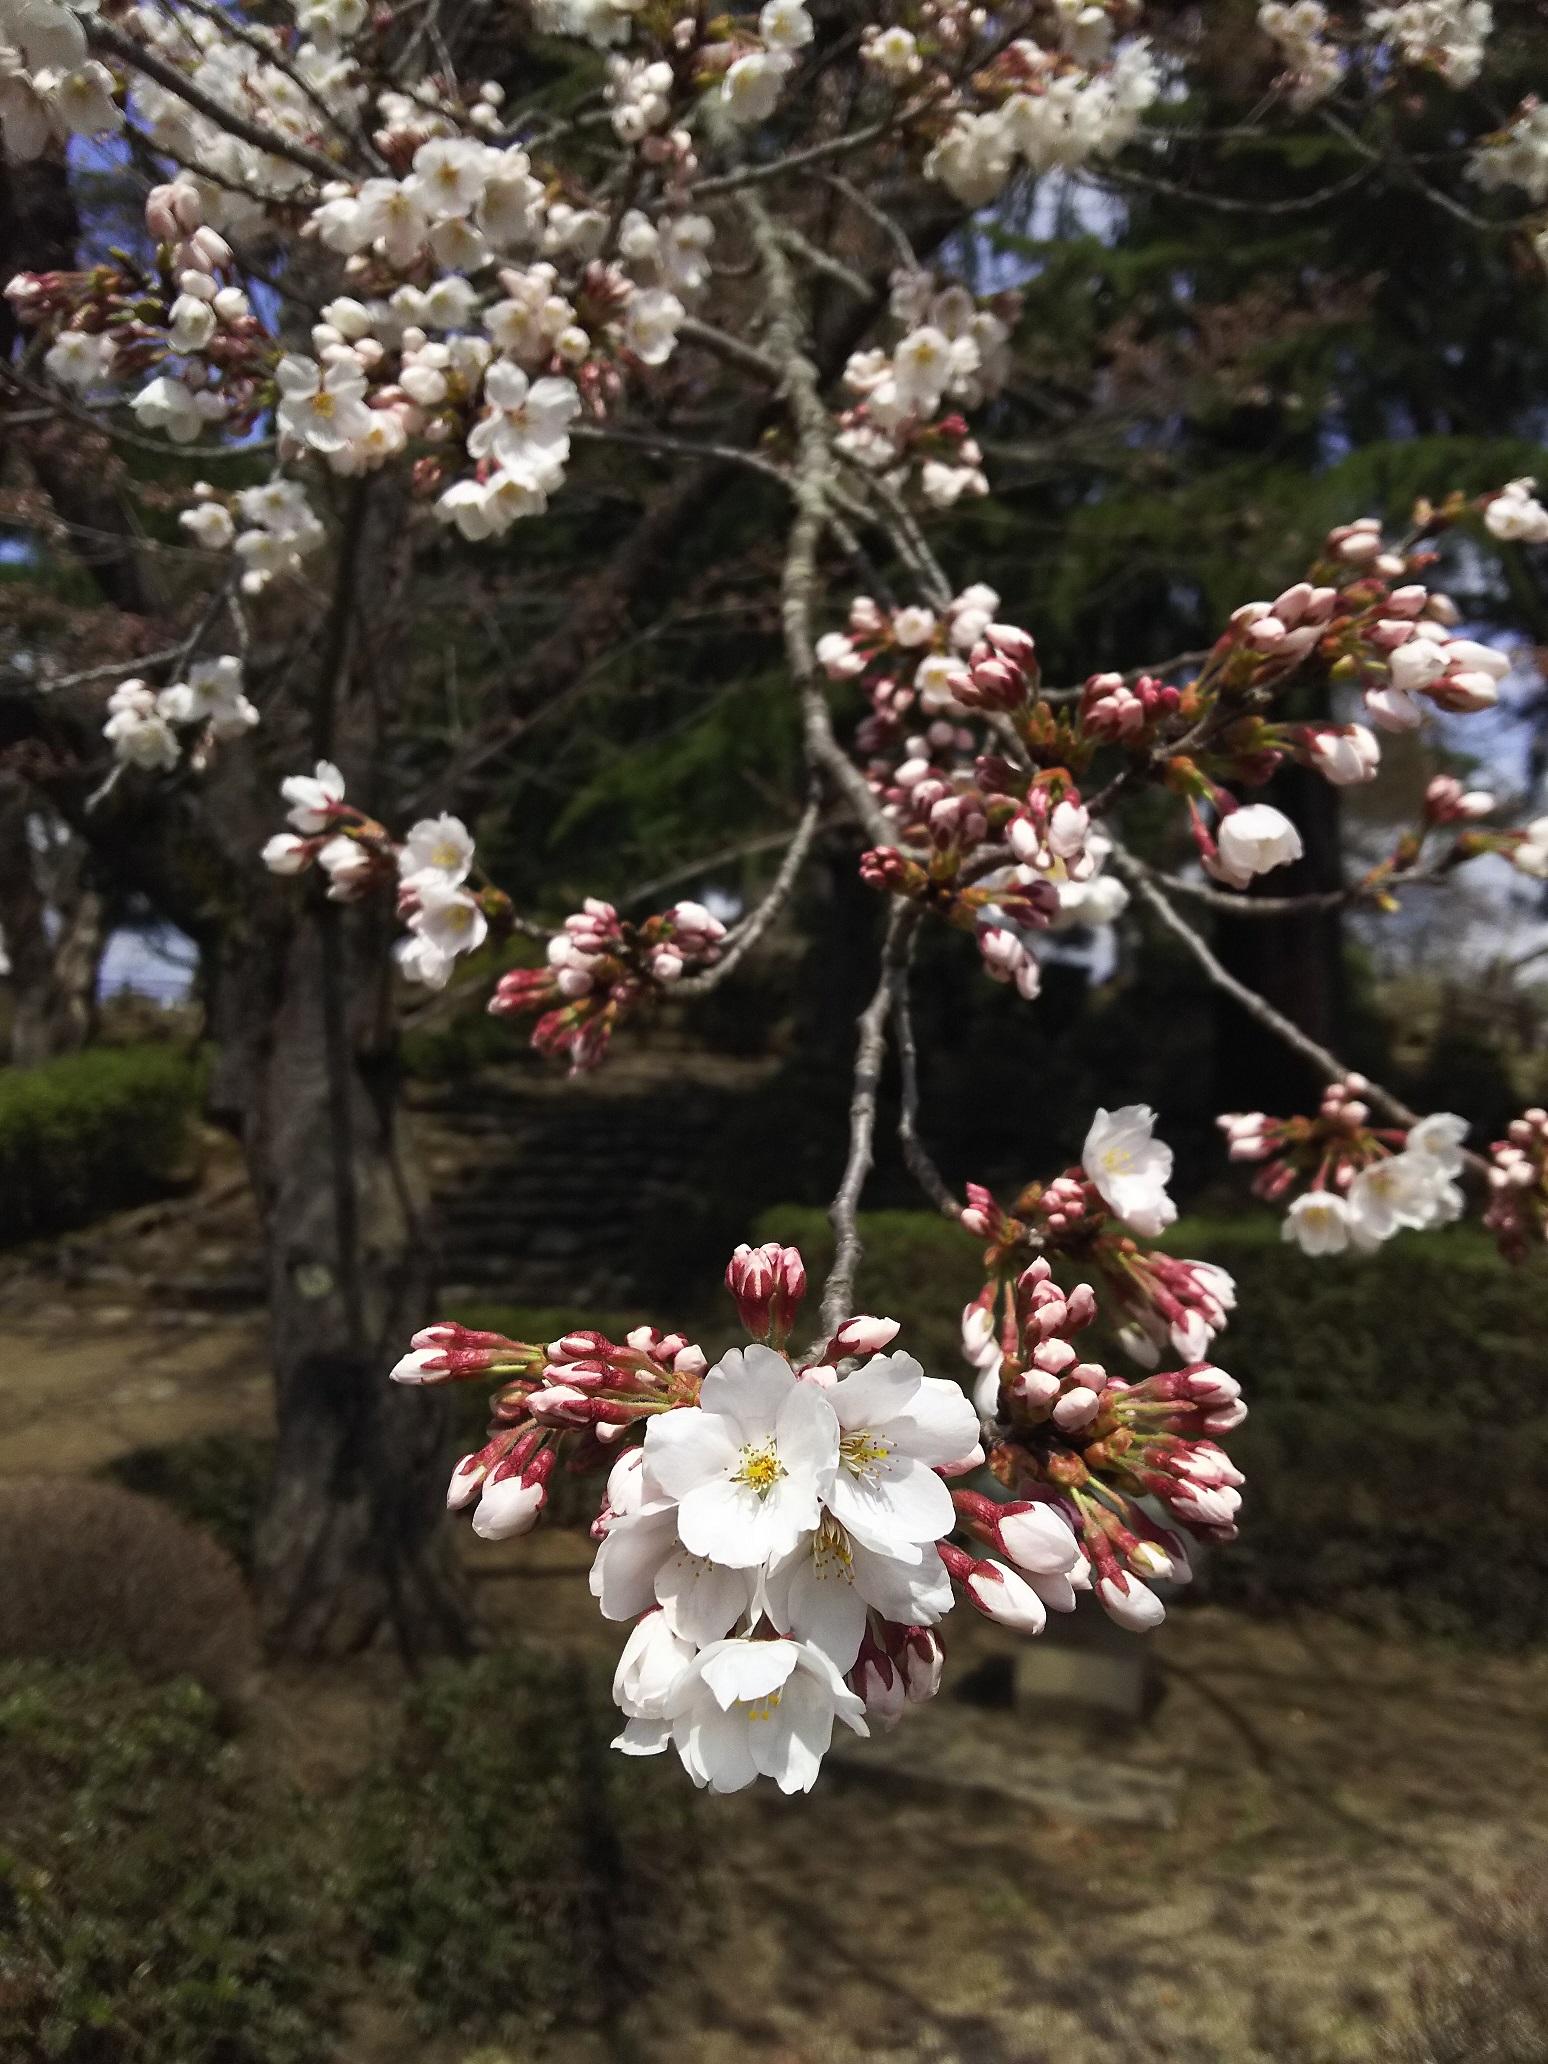 2017 Matsu-ga-saki Park (Uesugi Shrine) cherry tree information April 20: Image